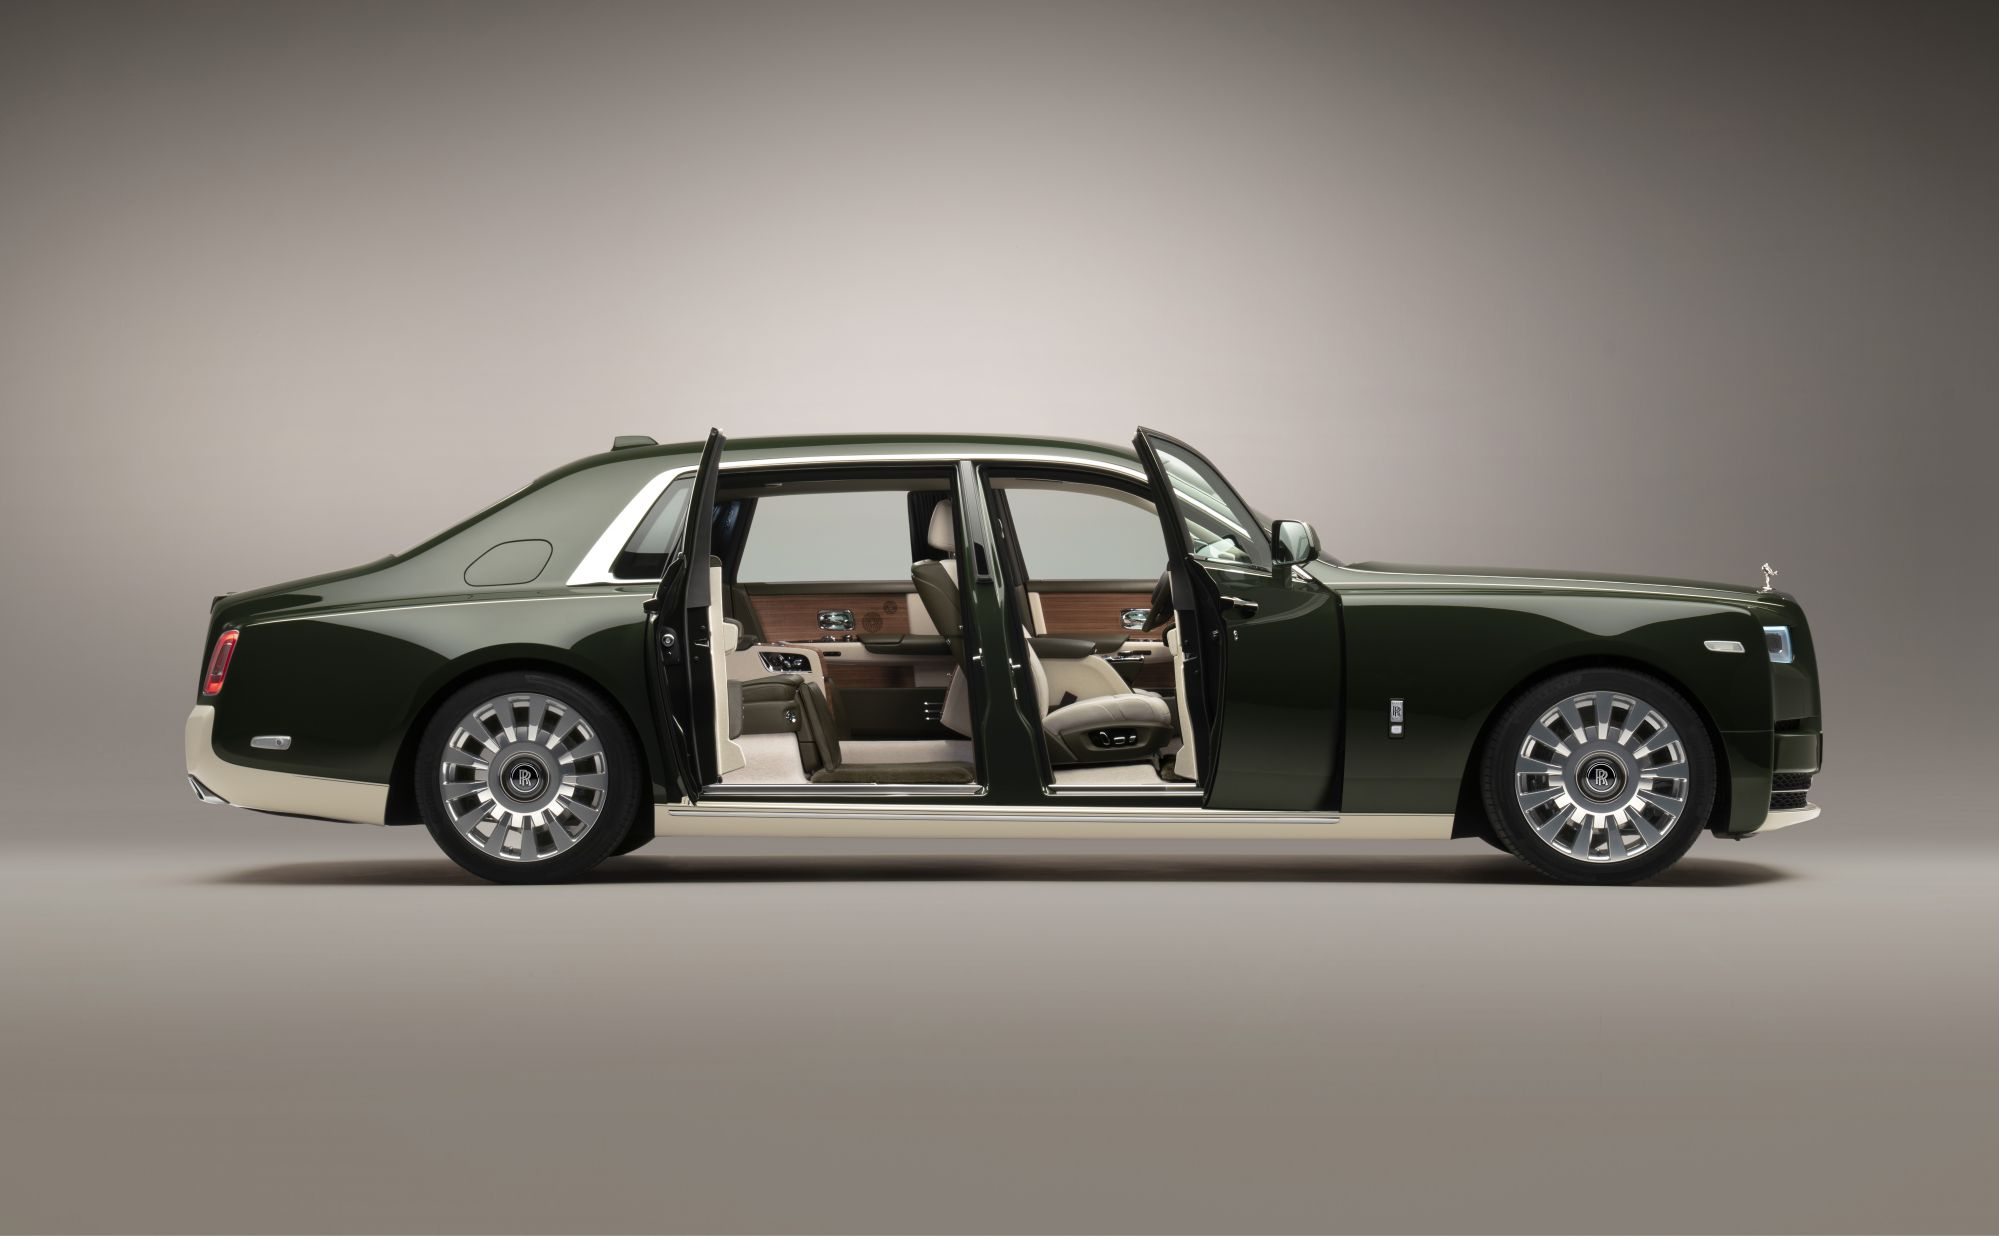 Hermès x Rolls-Royce Motor Cars collaborate for bespoke Phantom Oribe